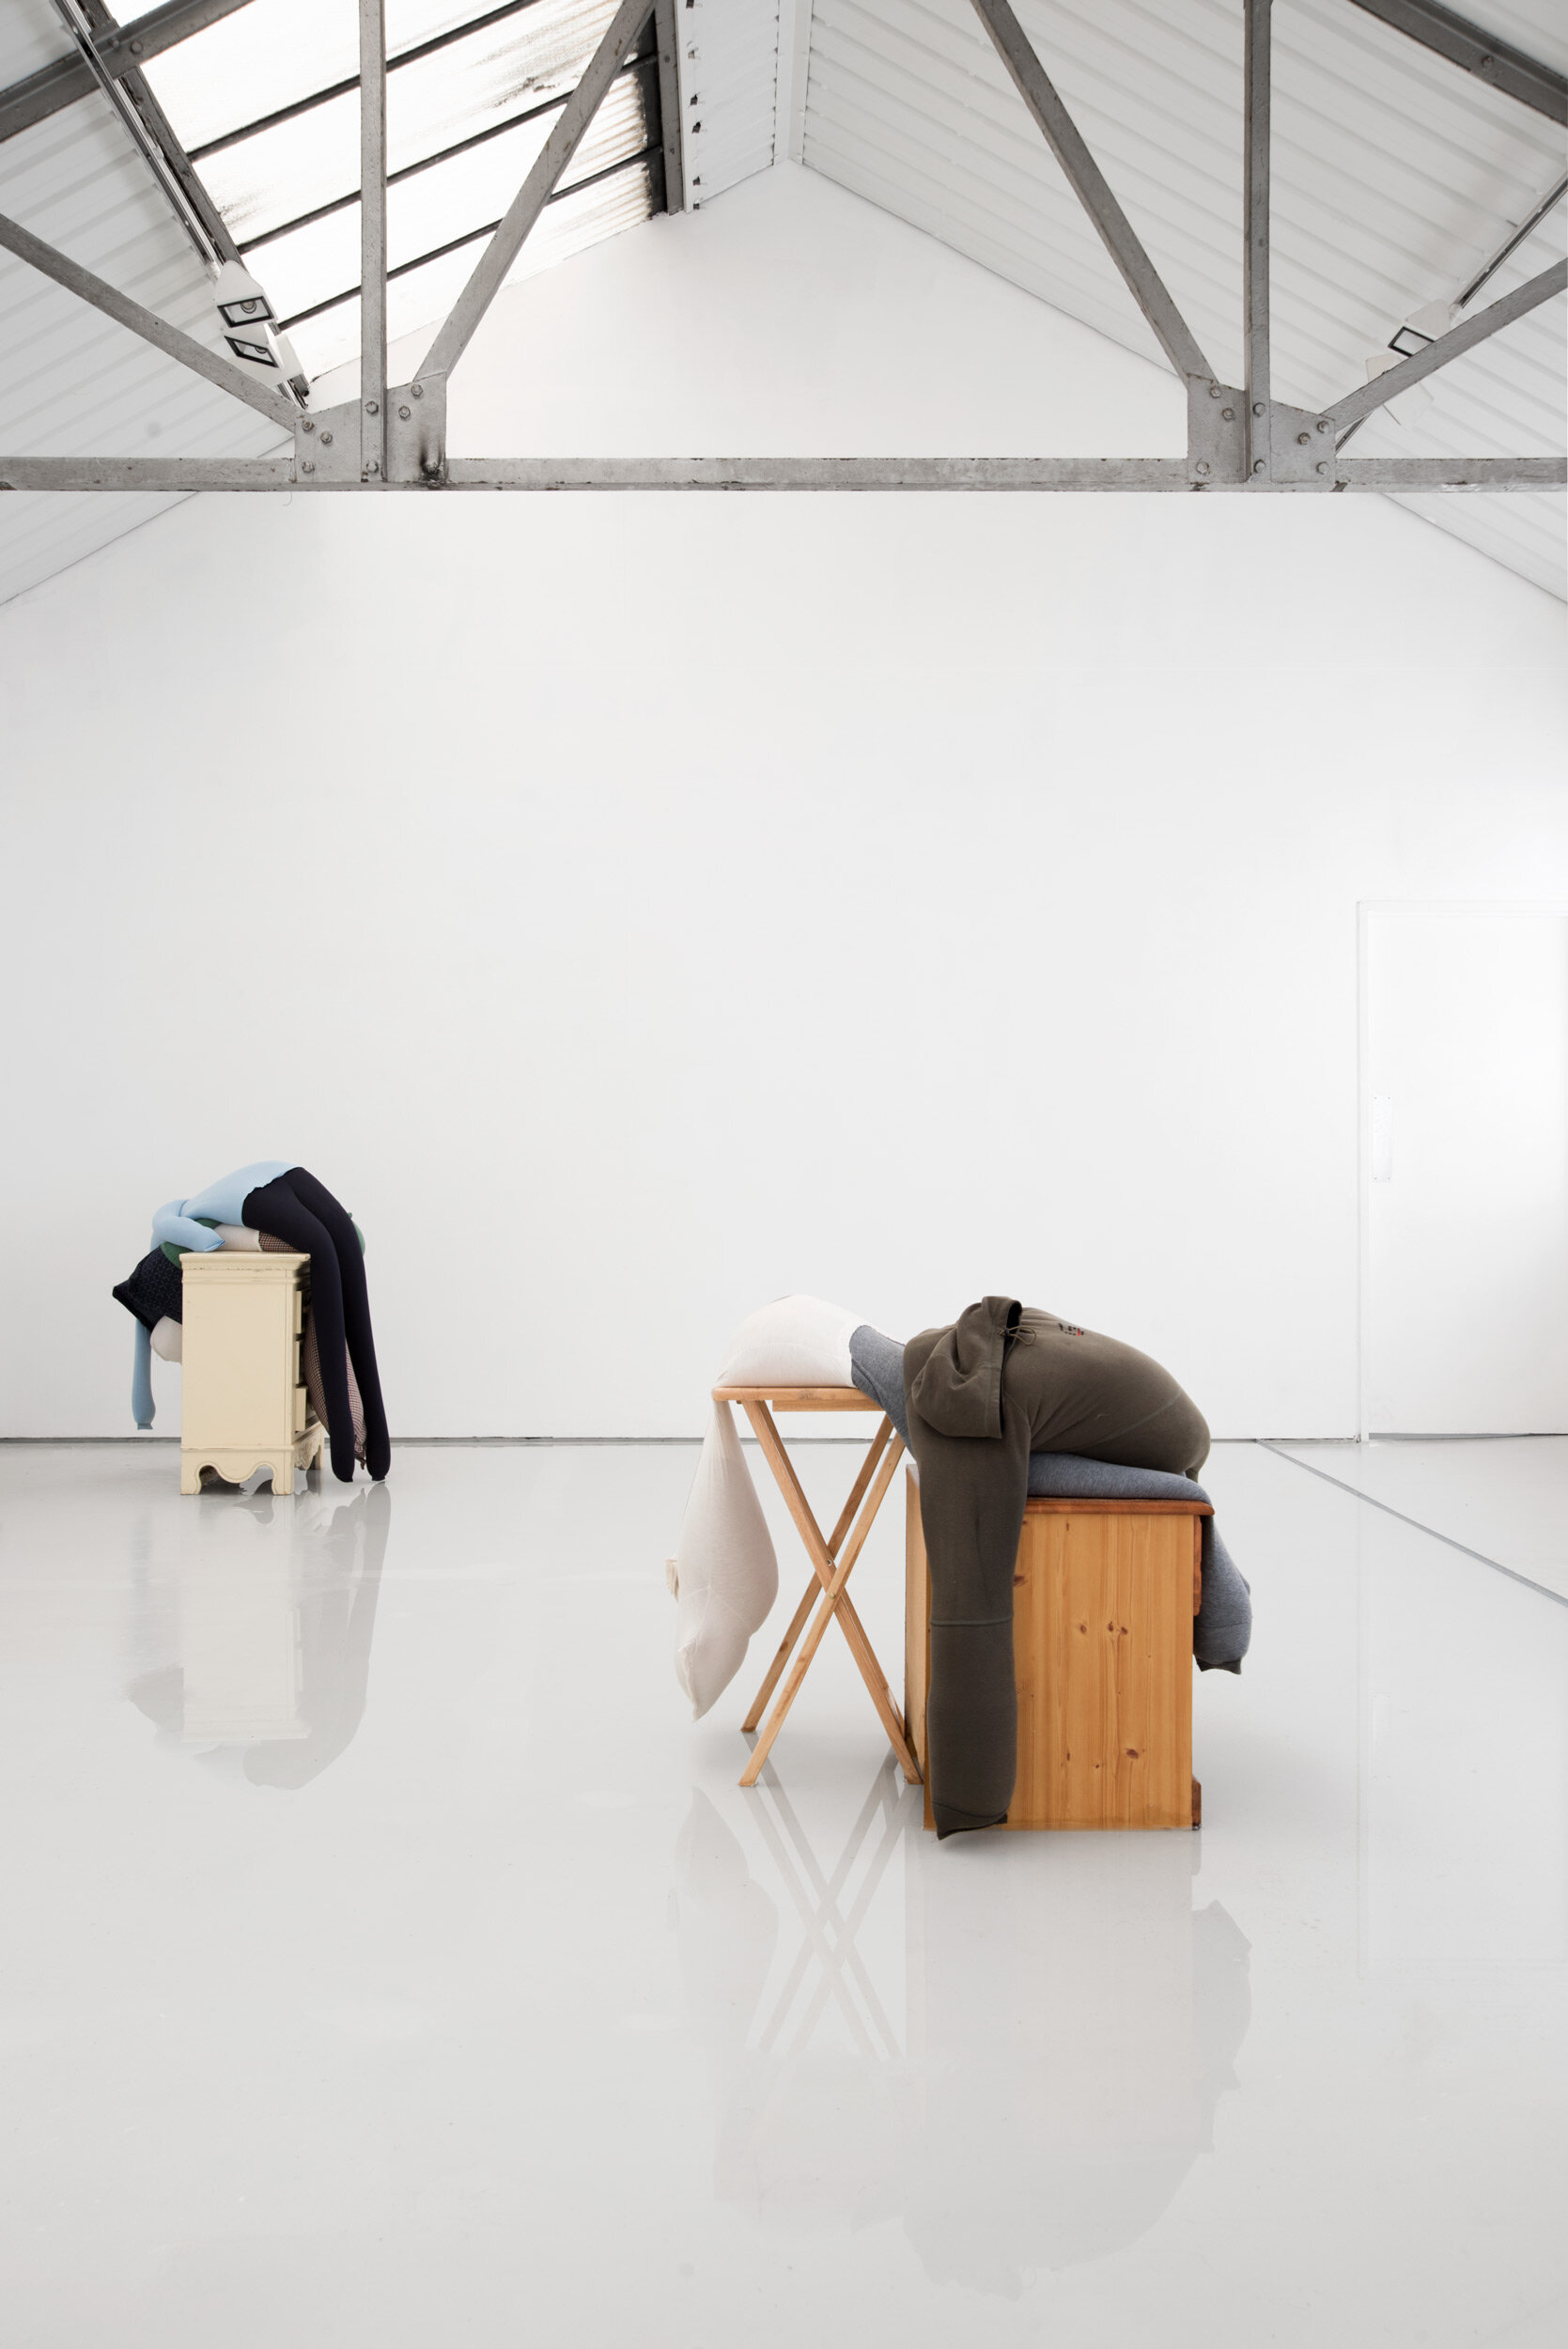 Fall, slump, drop on a bedside cabinet in water[...], Installation View, Alex Farrar, Bloc Projects, 2019, 4.jpg